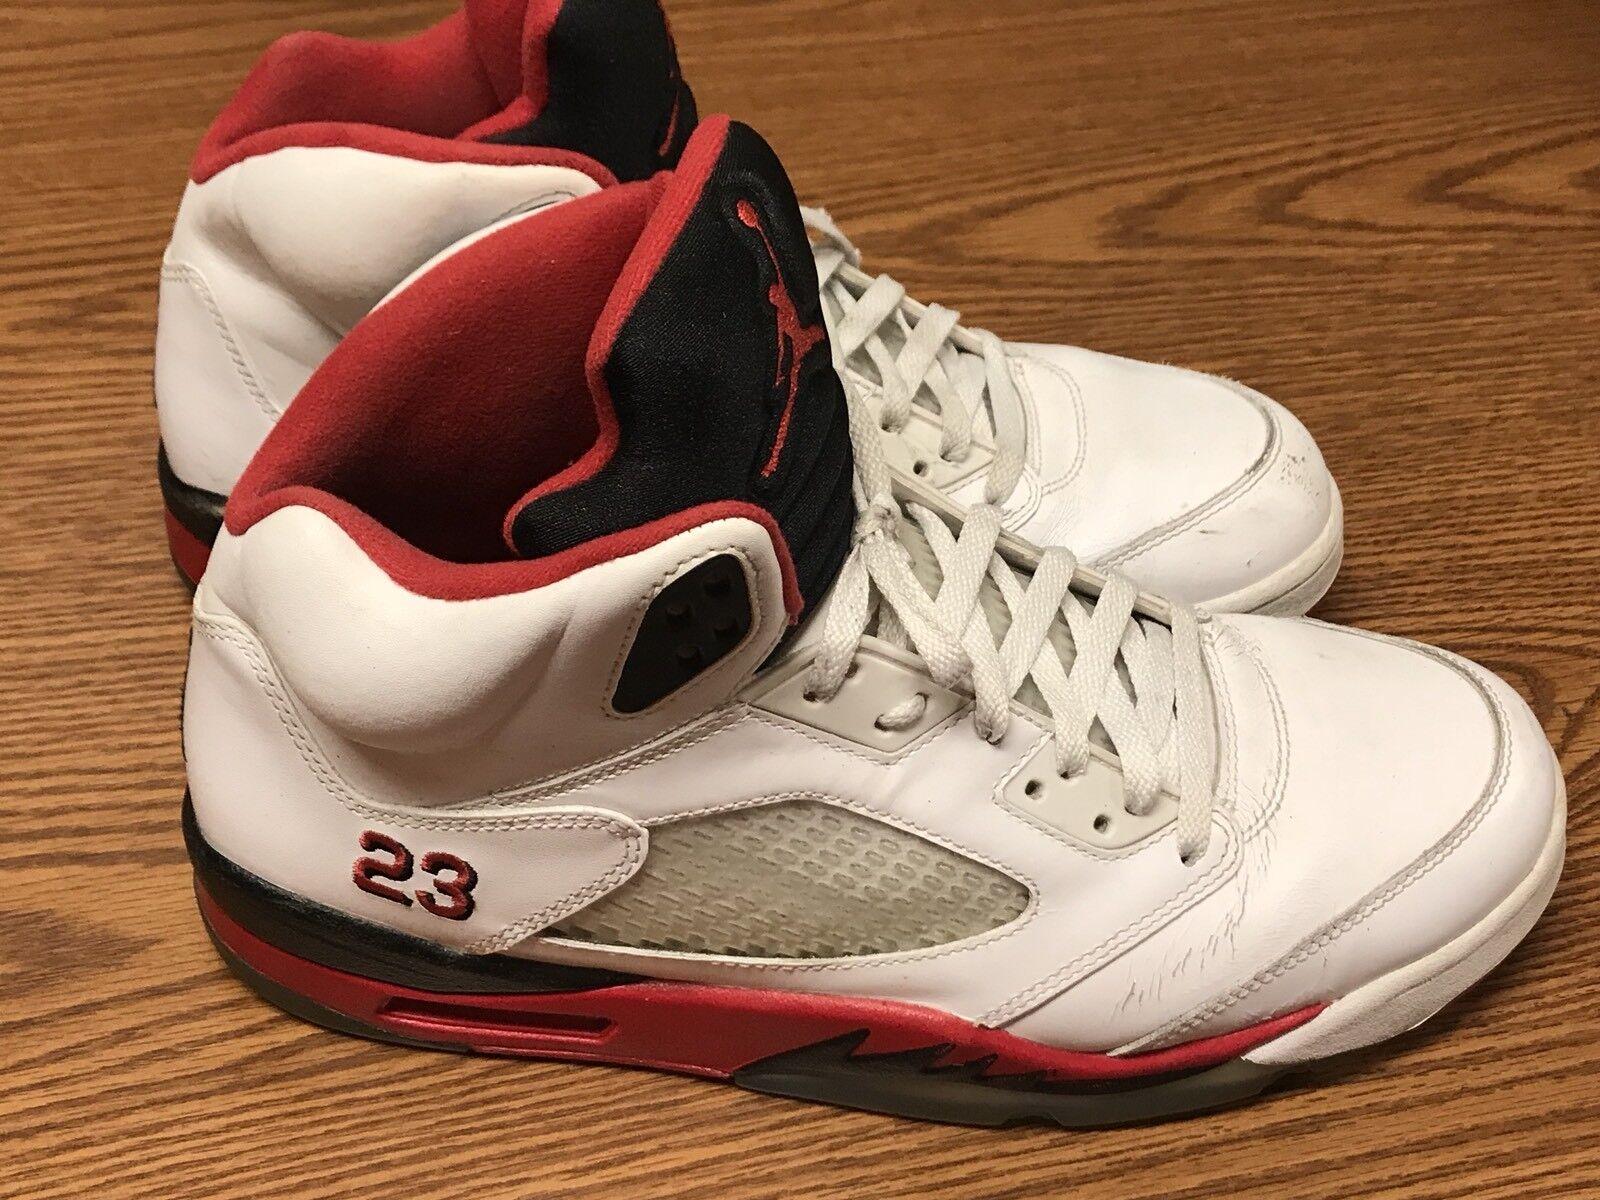 Nike 136027-120 Air Jordan 5 Retro Fire Red Black White Basketball Shoe Sz 12